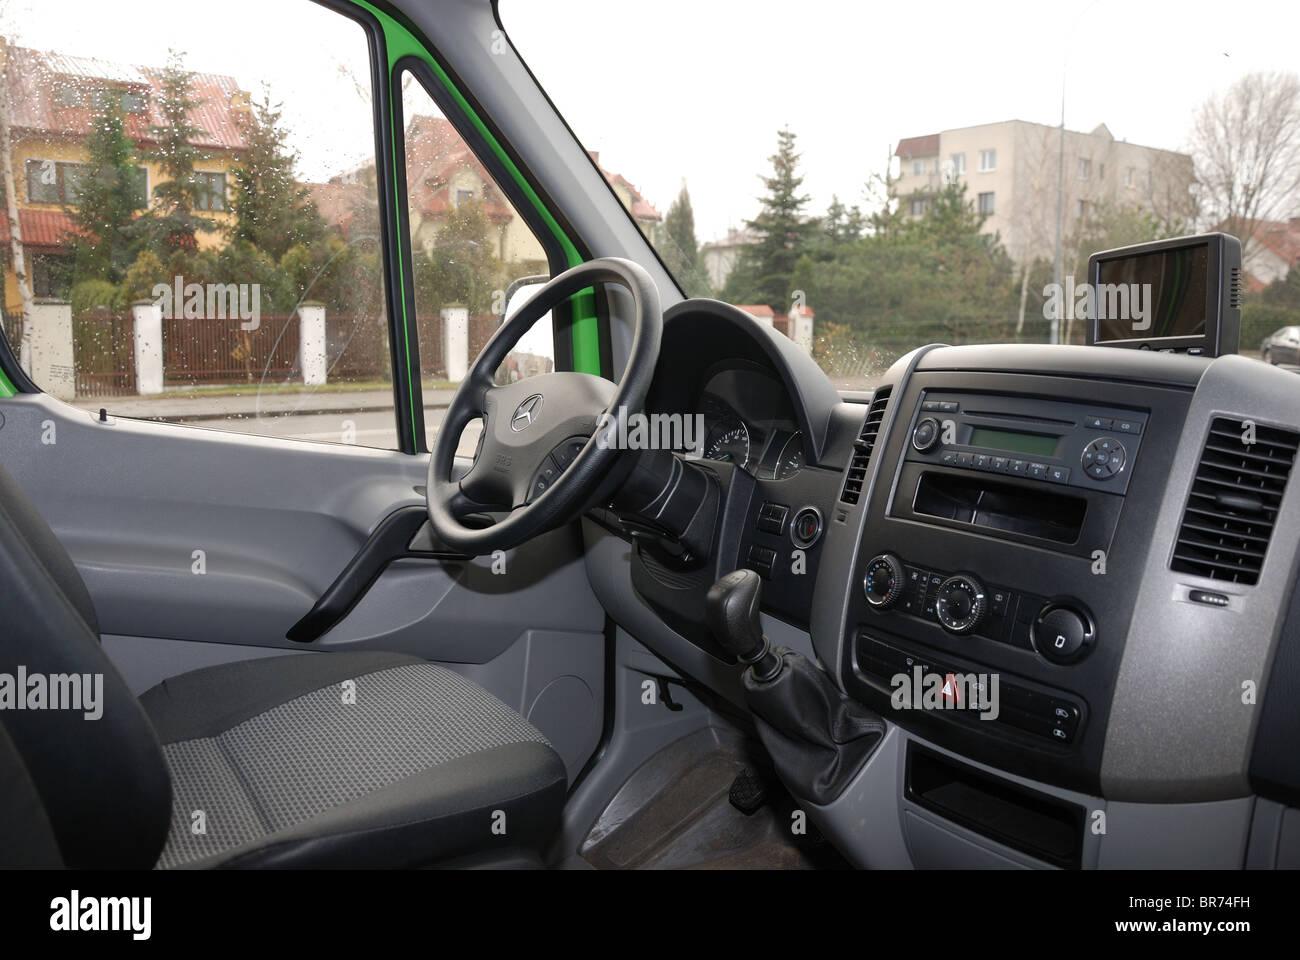 Mercedes benz sprinter 260 cdi van green l3h2 german mcv panel van details inside cabin interior